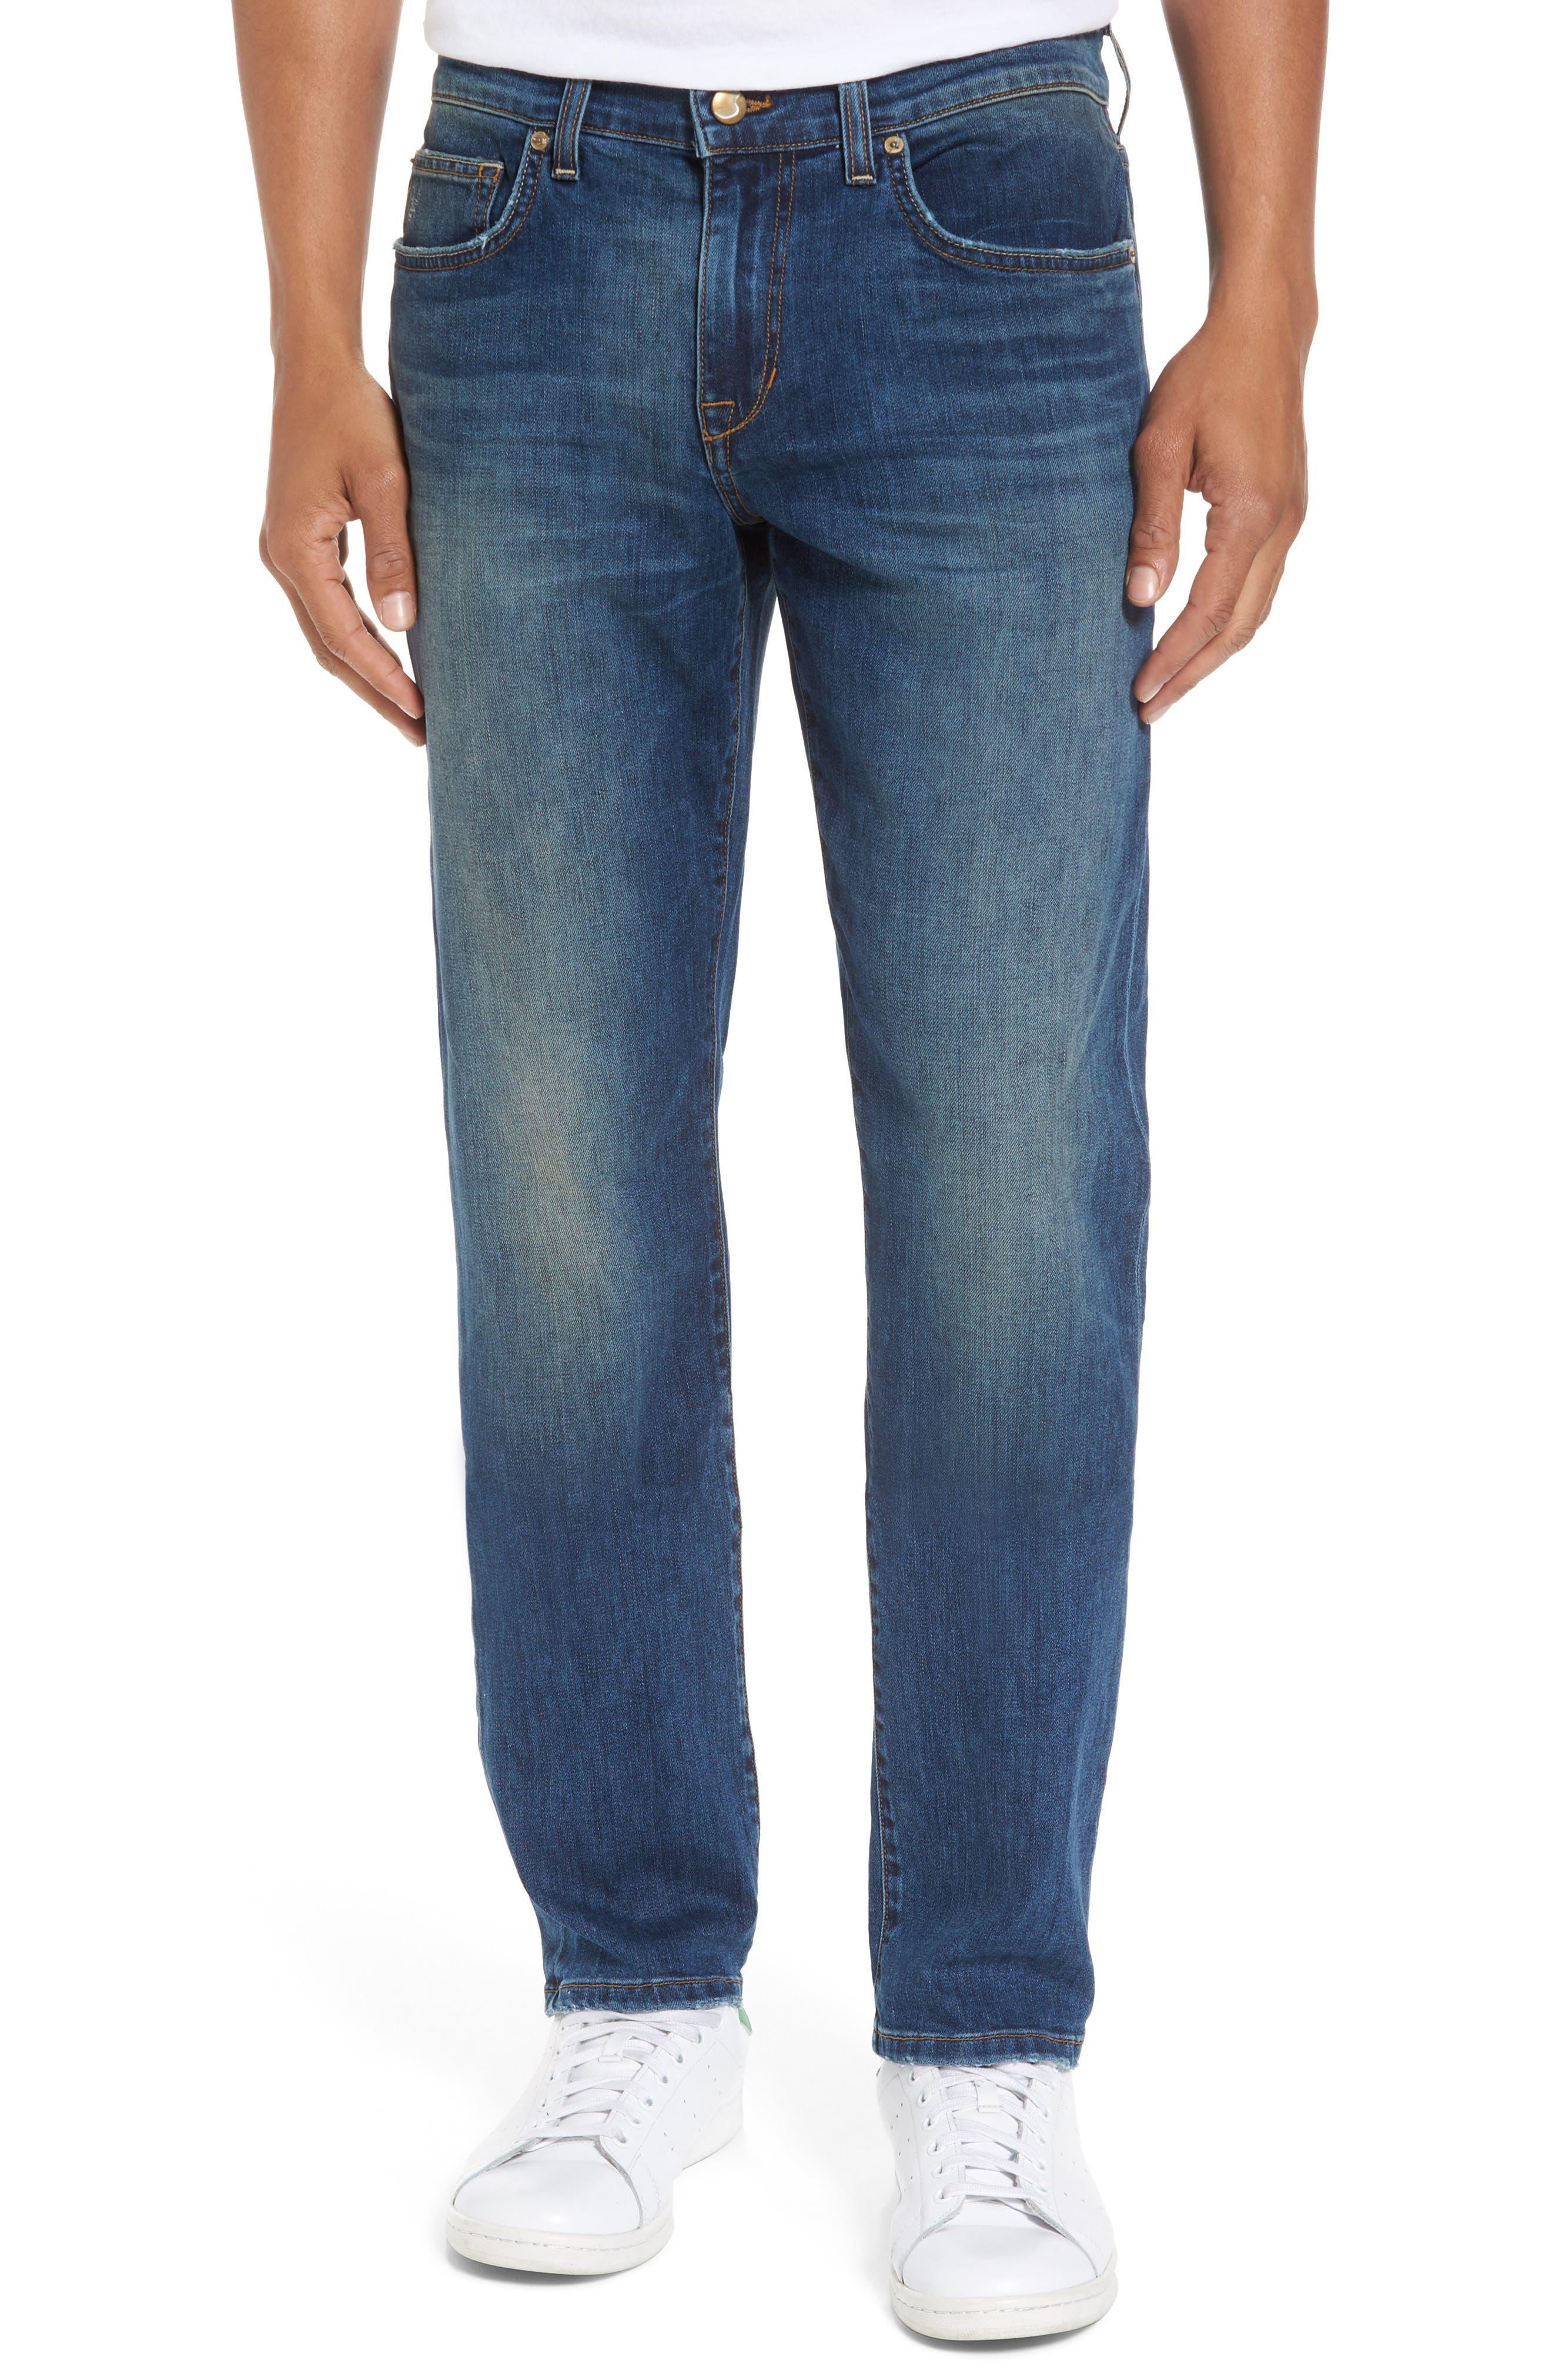 Alternate Image 1 Selected - Joe's Slim Fit Jeans (Dalton)